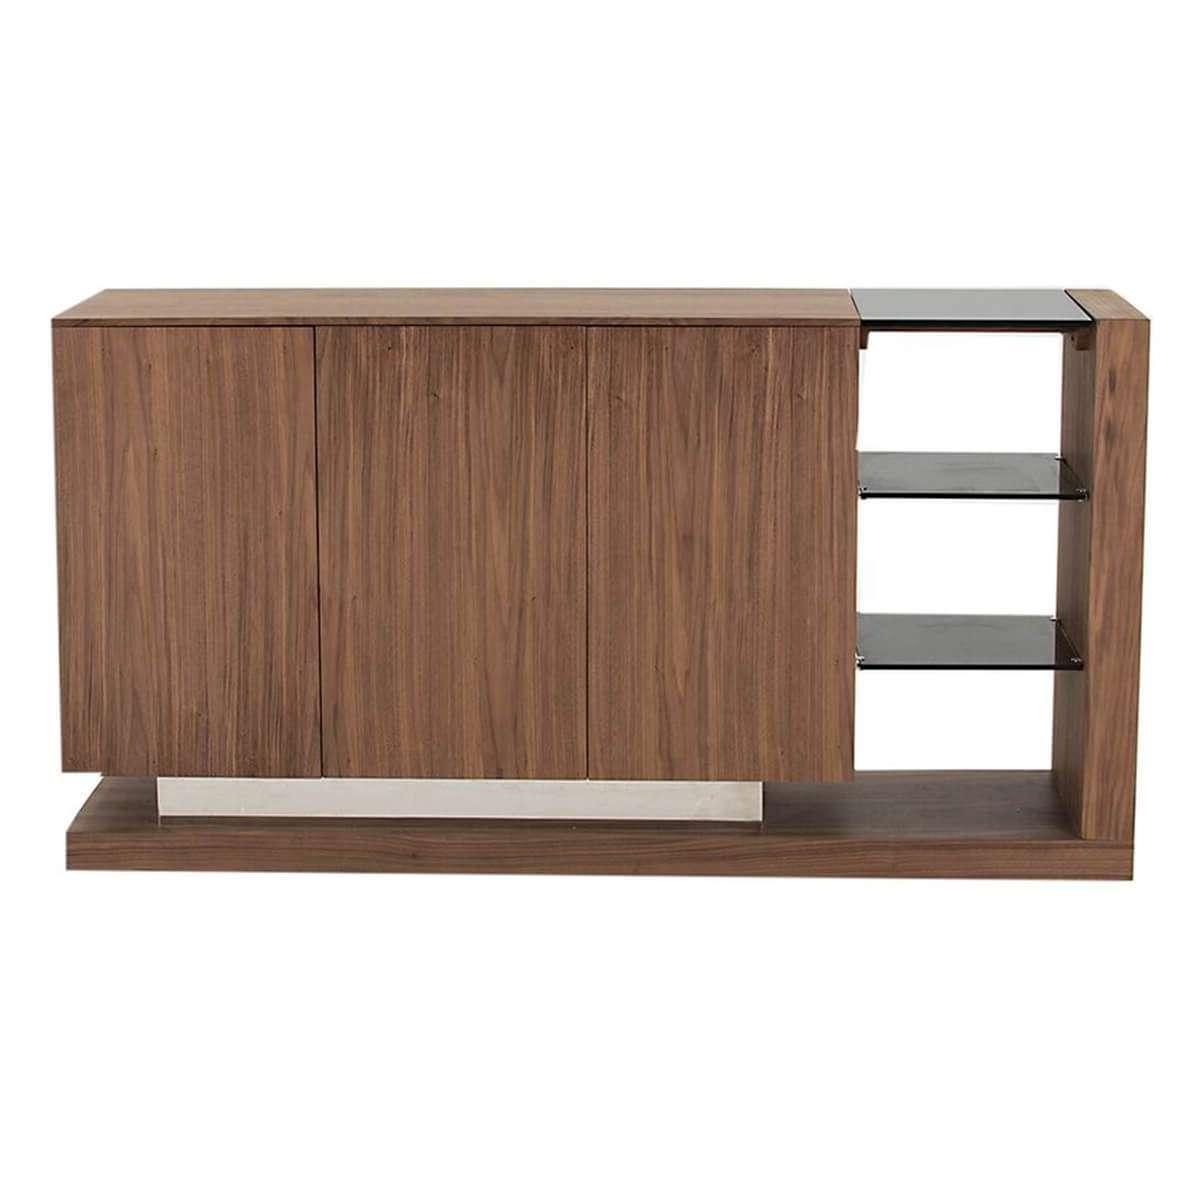 Almara Steel & Walnut Sideboard | Modern Sideboards | Fads Throughout Modern Sideboards (View 13 of 20)